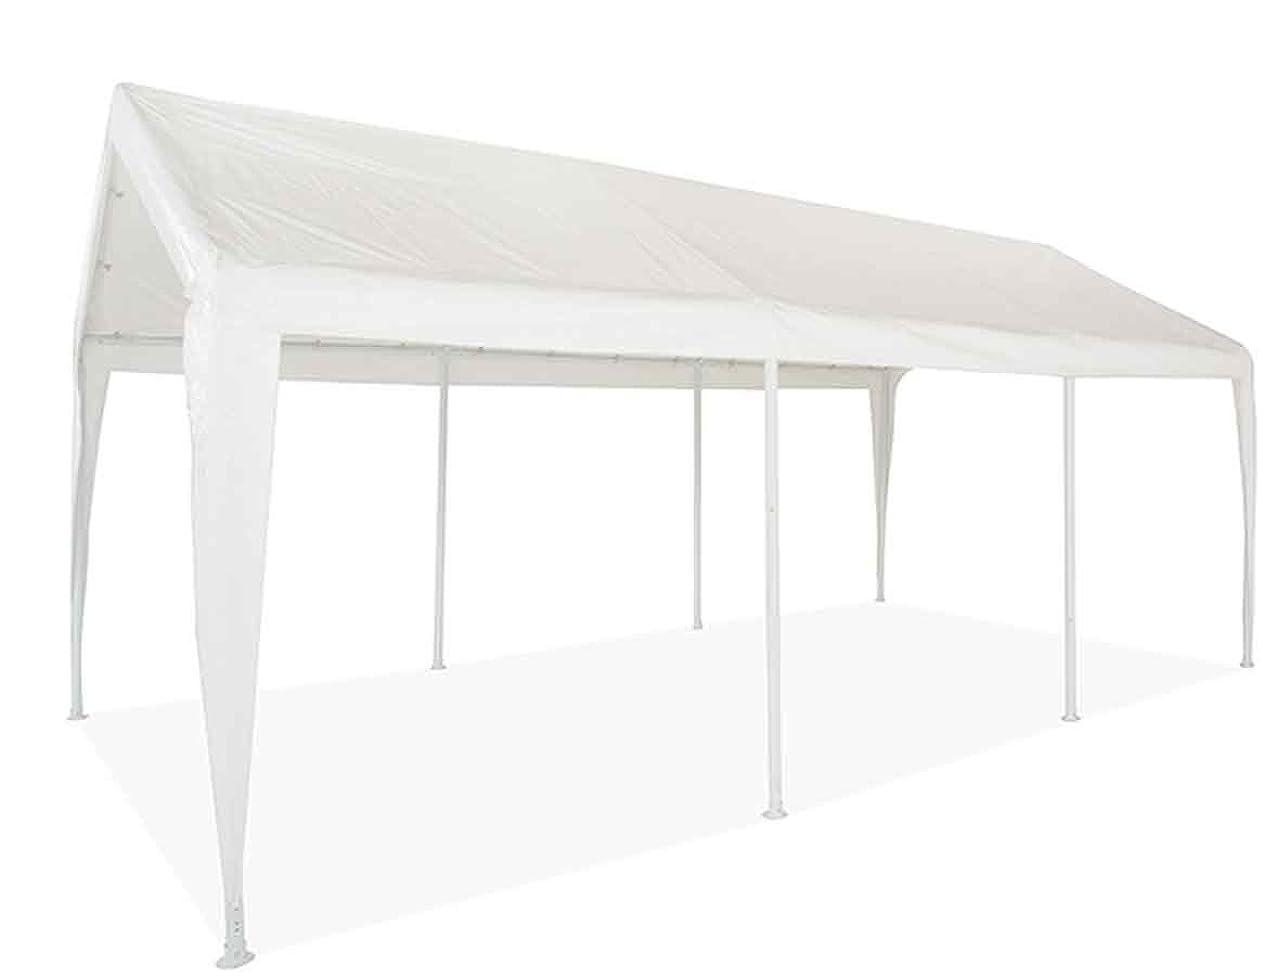 Impact Canopy 10' x 20' Portable Carport Garage, Sun and Rain Shelter, Wedding Shelter, Party Shade, 8 Legs, White